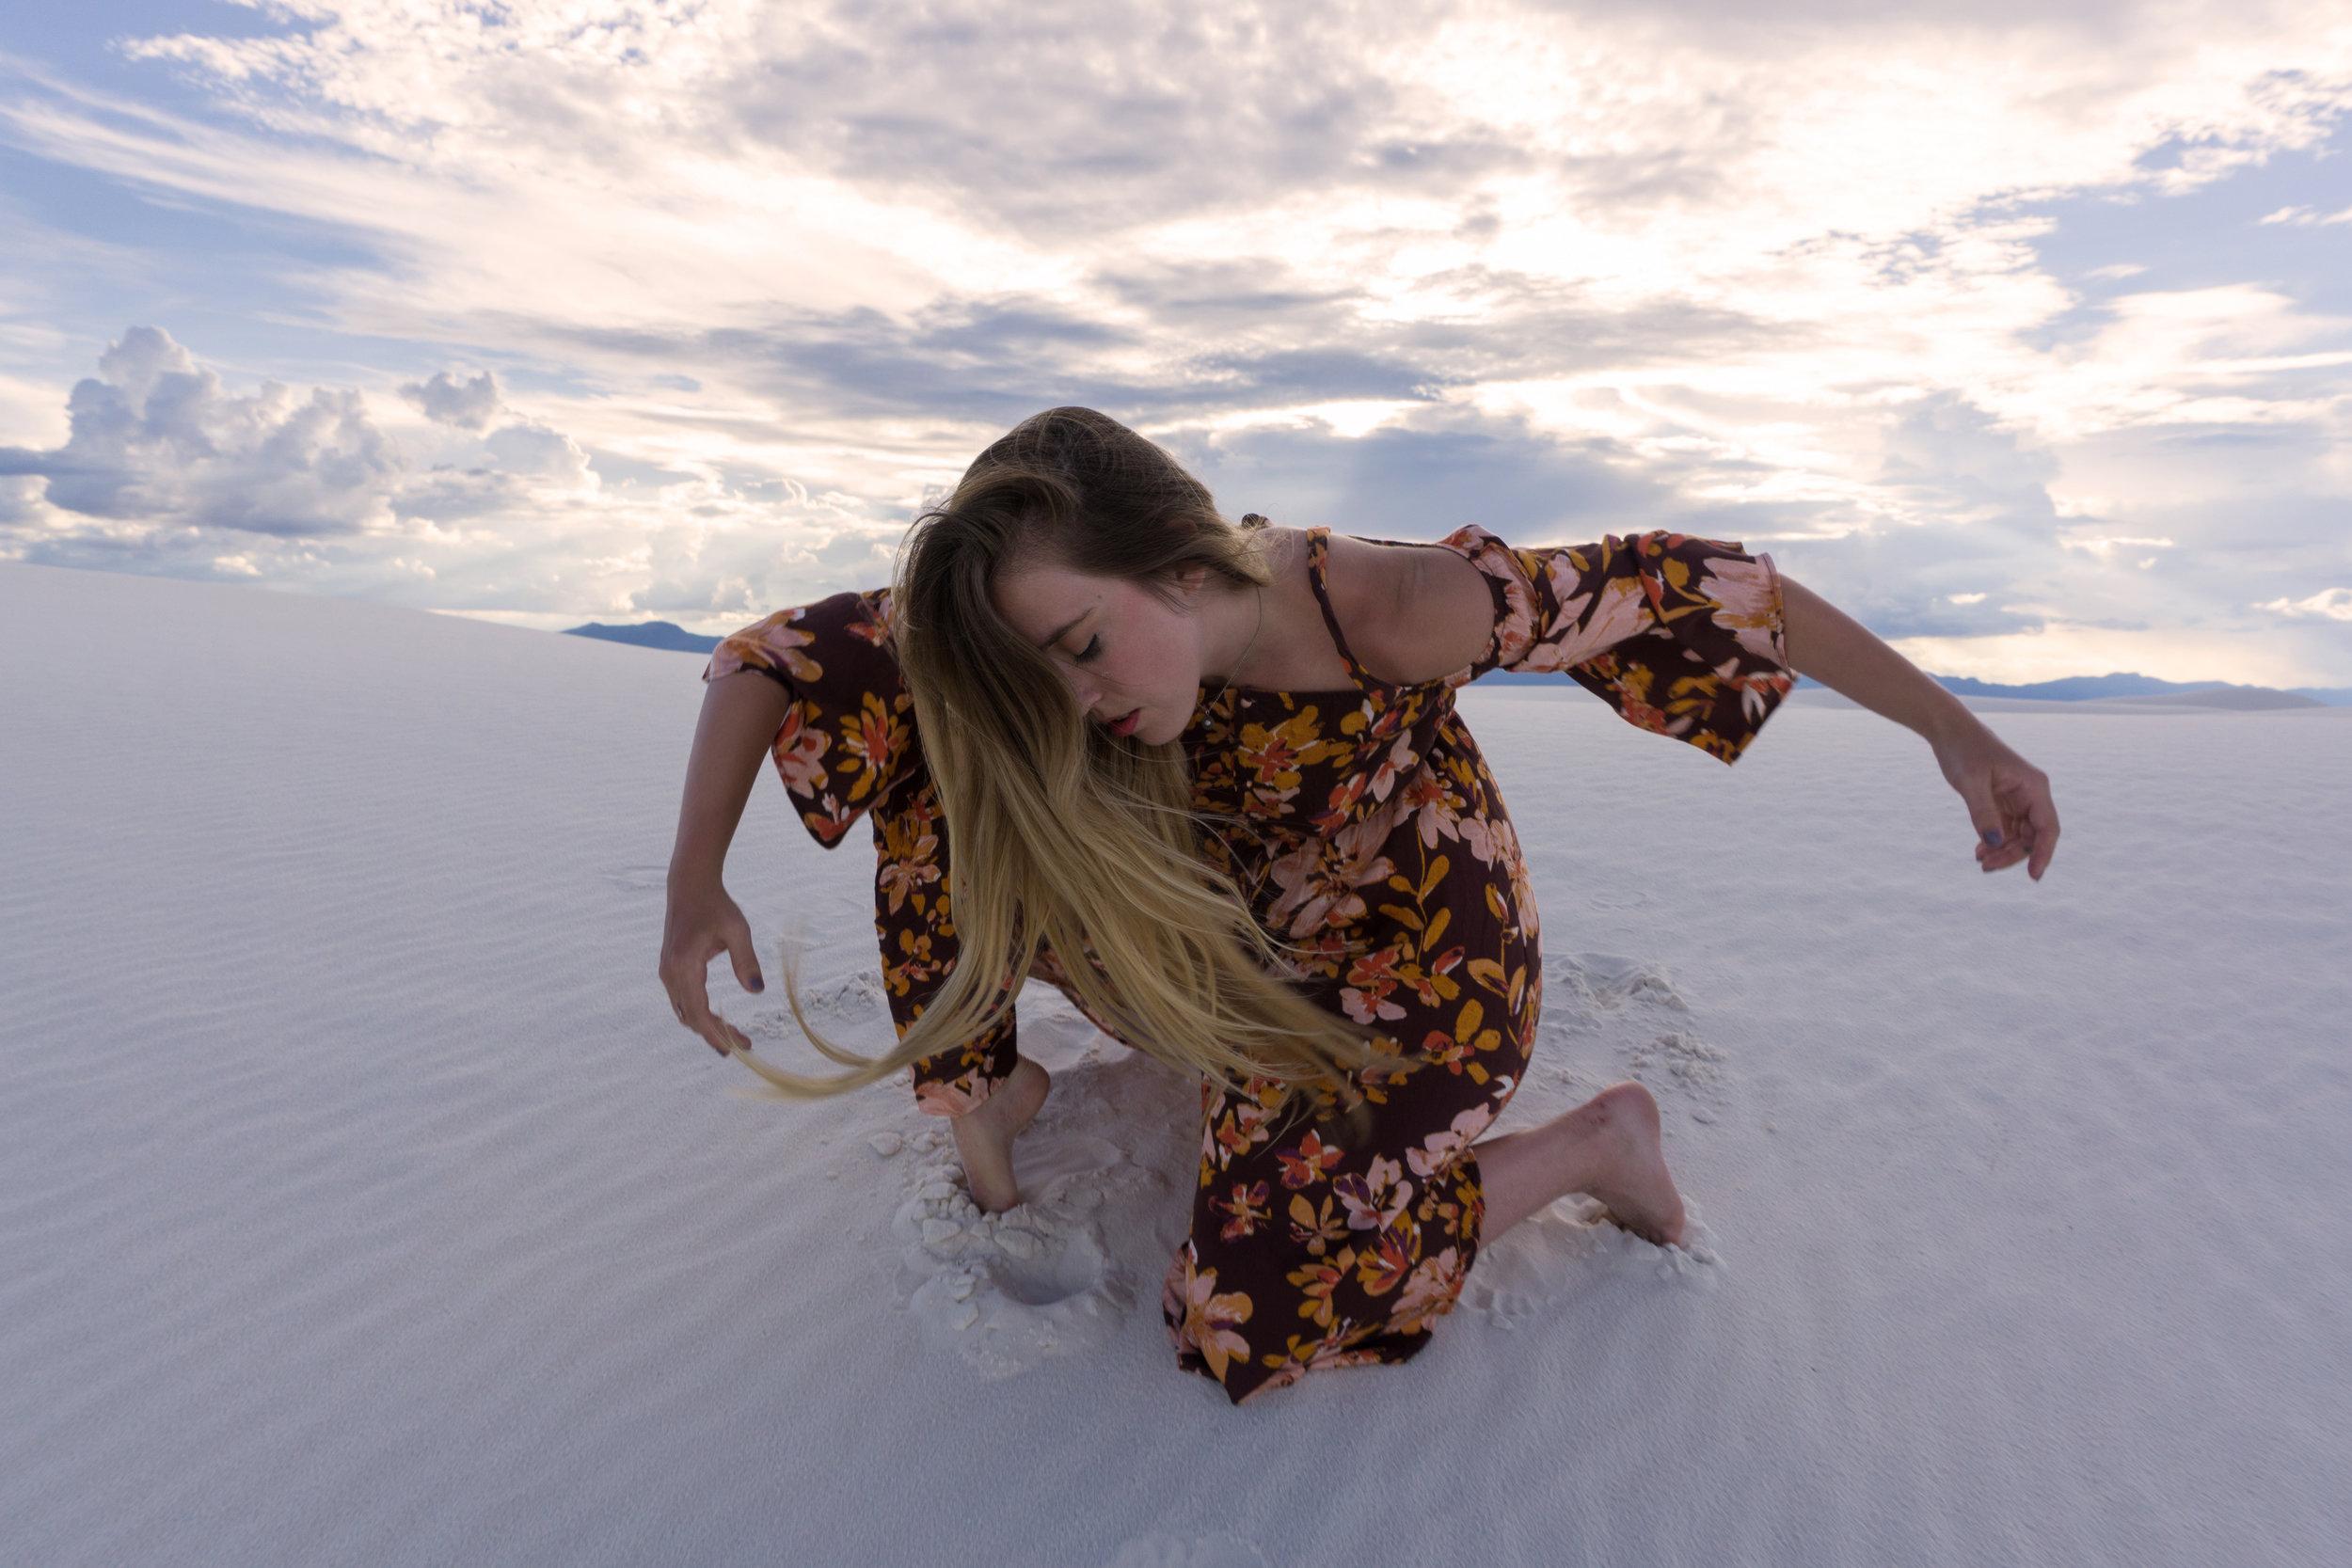 AstroBandit_JordanRose_WhiteSands_Dancing_Dancer_SomedaysLovin_GypsumSand_8.jpg